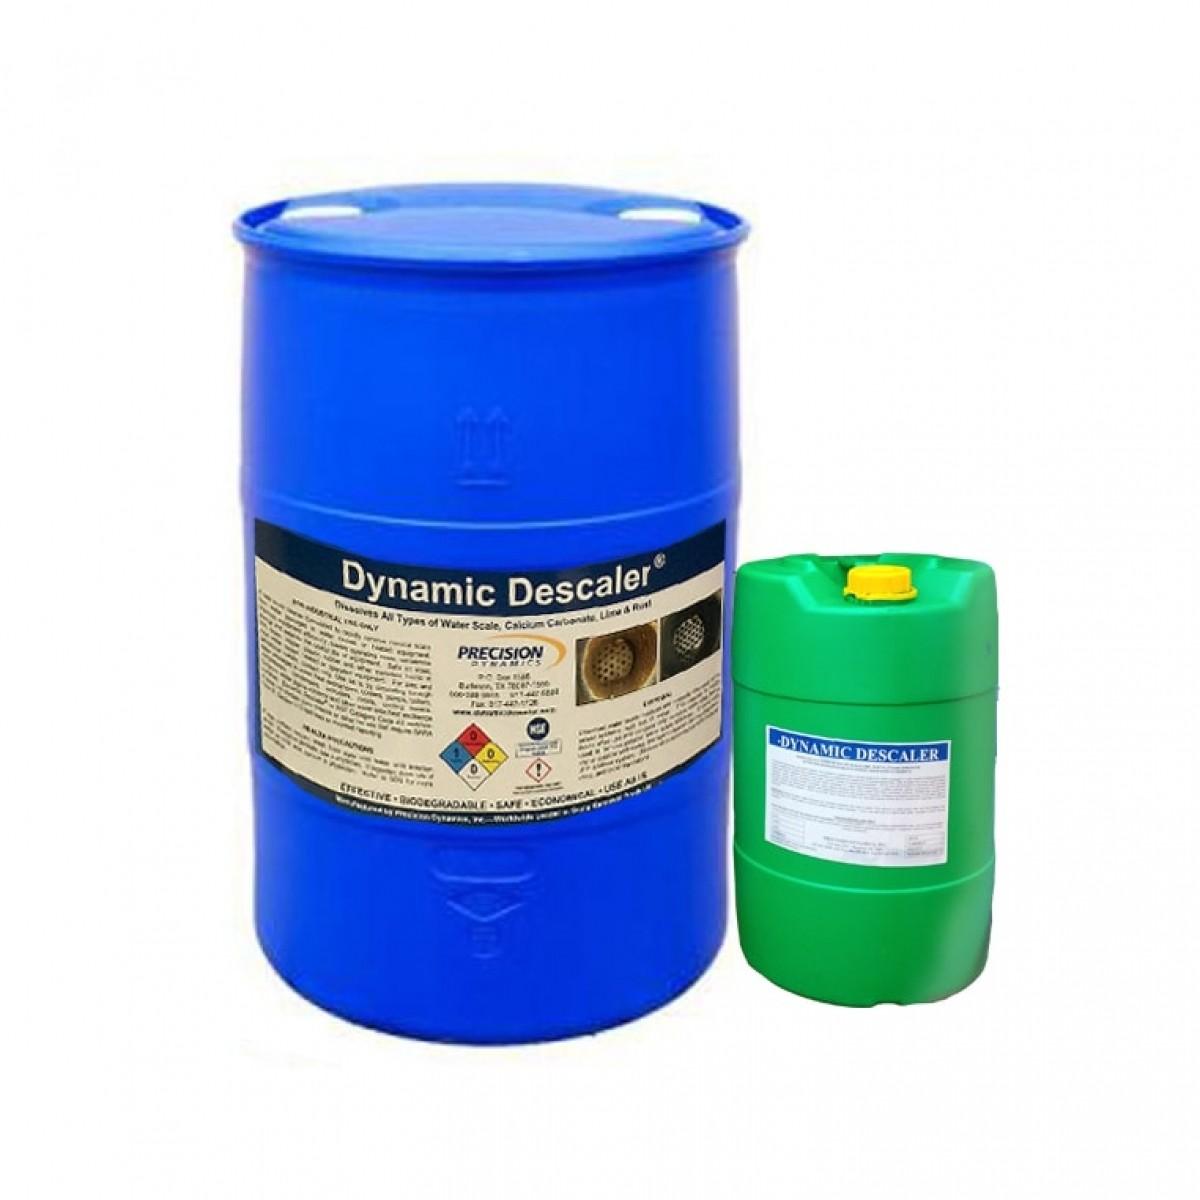 Chất tẩy cáu cặn Dynamic descaler, Mỹ, 25 lít/can